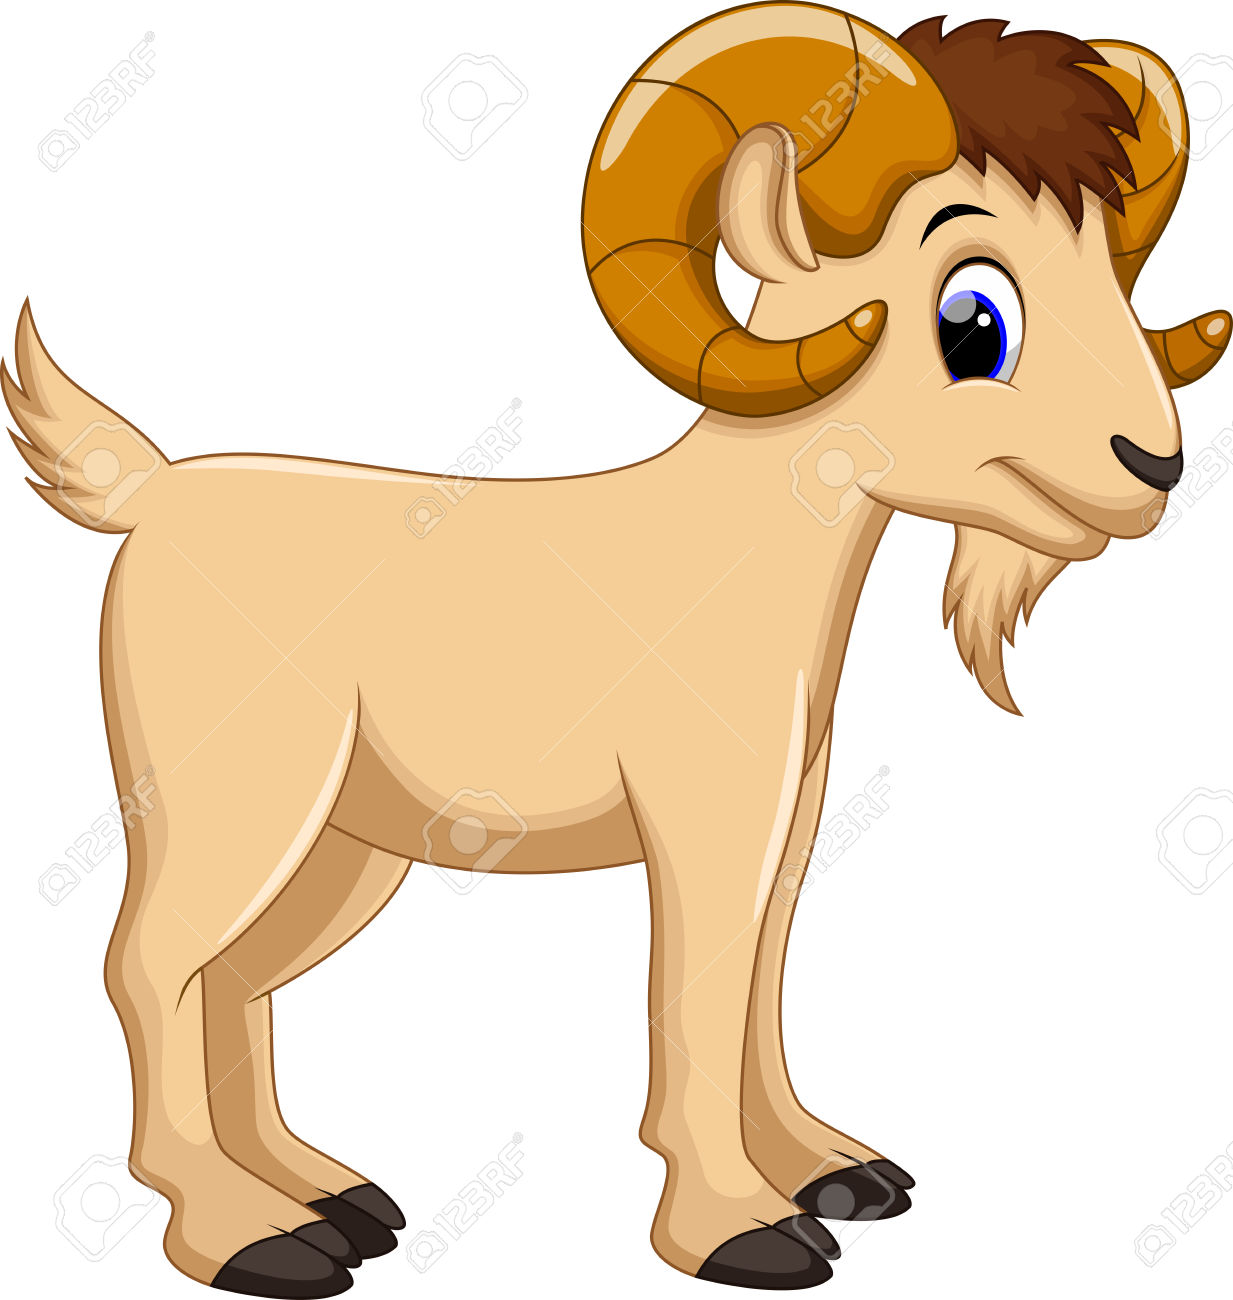 Cute Cartoon Goat Clipart #1-Cute Cartoon Goat Clipart #1-3